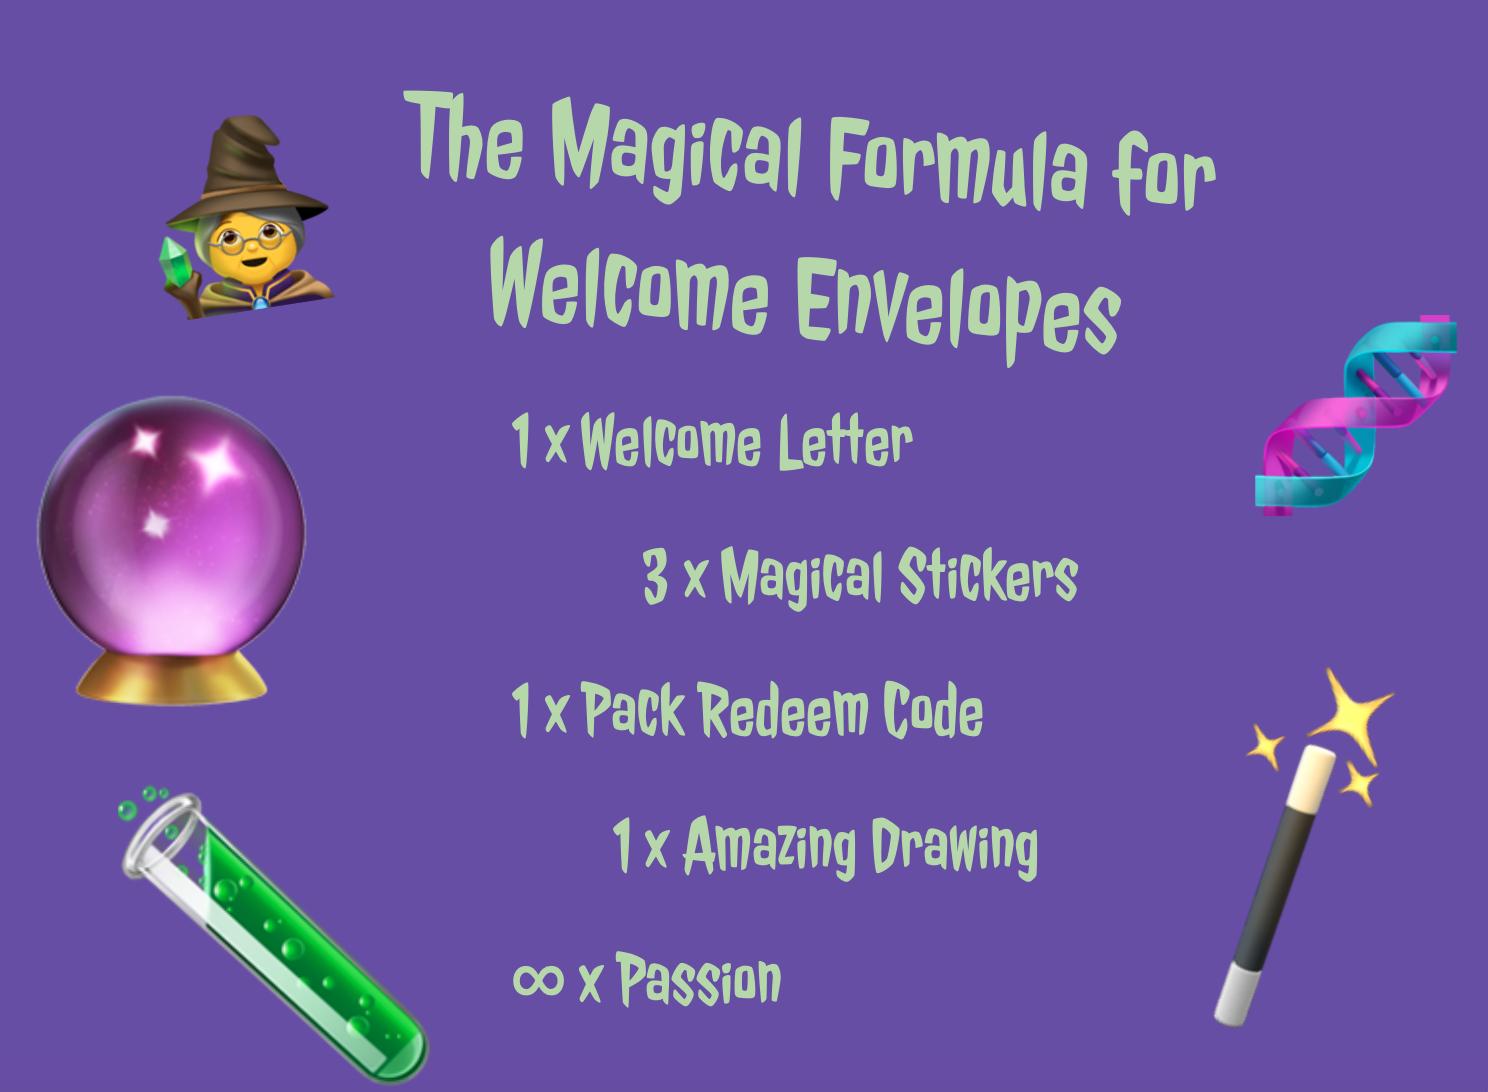 https://cloud-prn4hdmiu.vercel.app/0the_magical_formula_for__welcome_envelopes.png